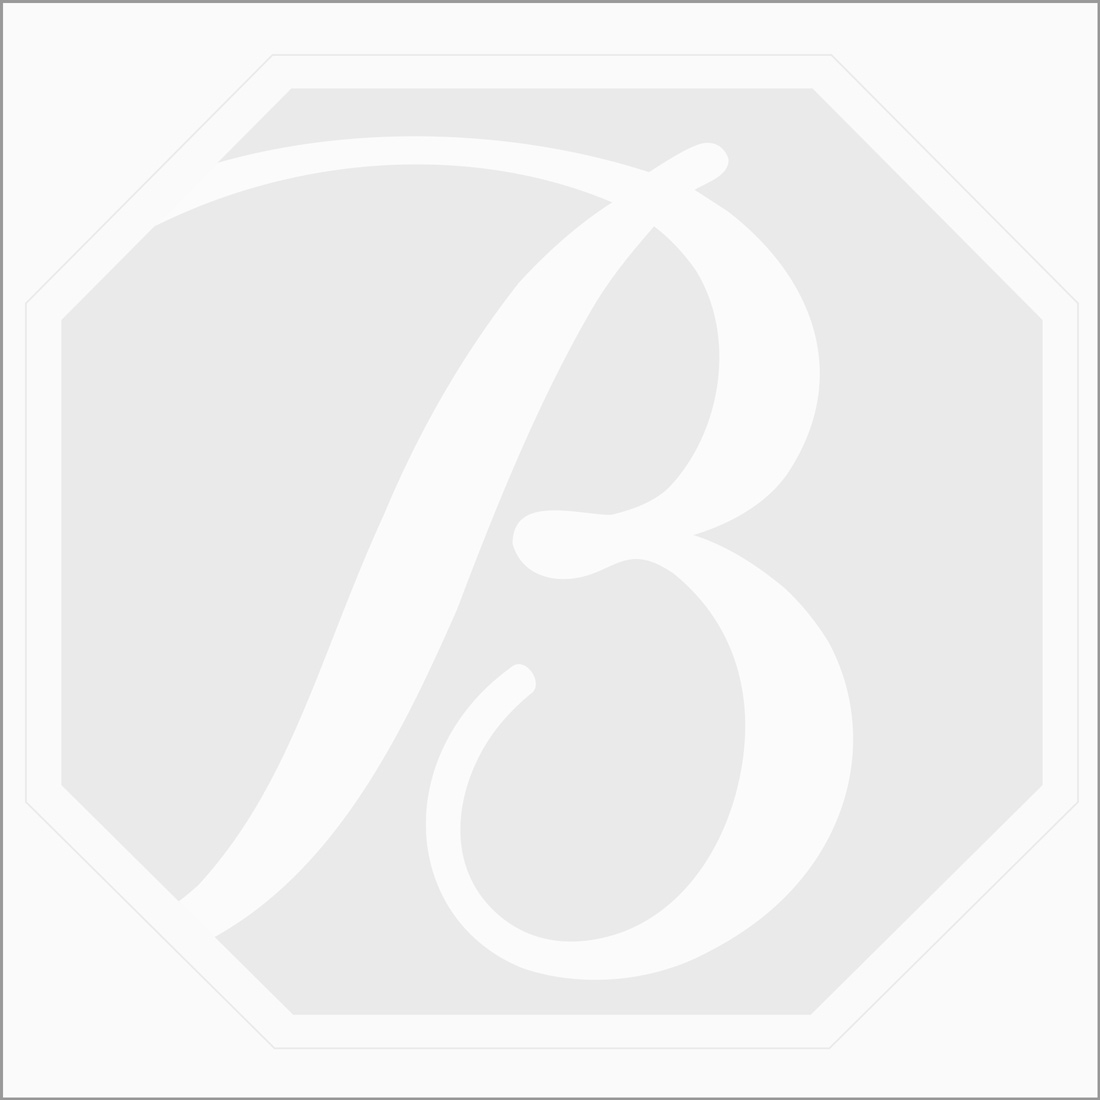 1 pc - Yellow Tourmaline Rose Cut - 5.27 ct. - 15 x 13.3 x 3 mm (TRC1058)